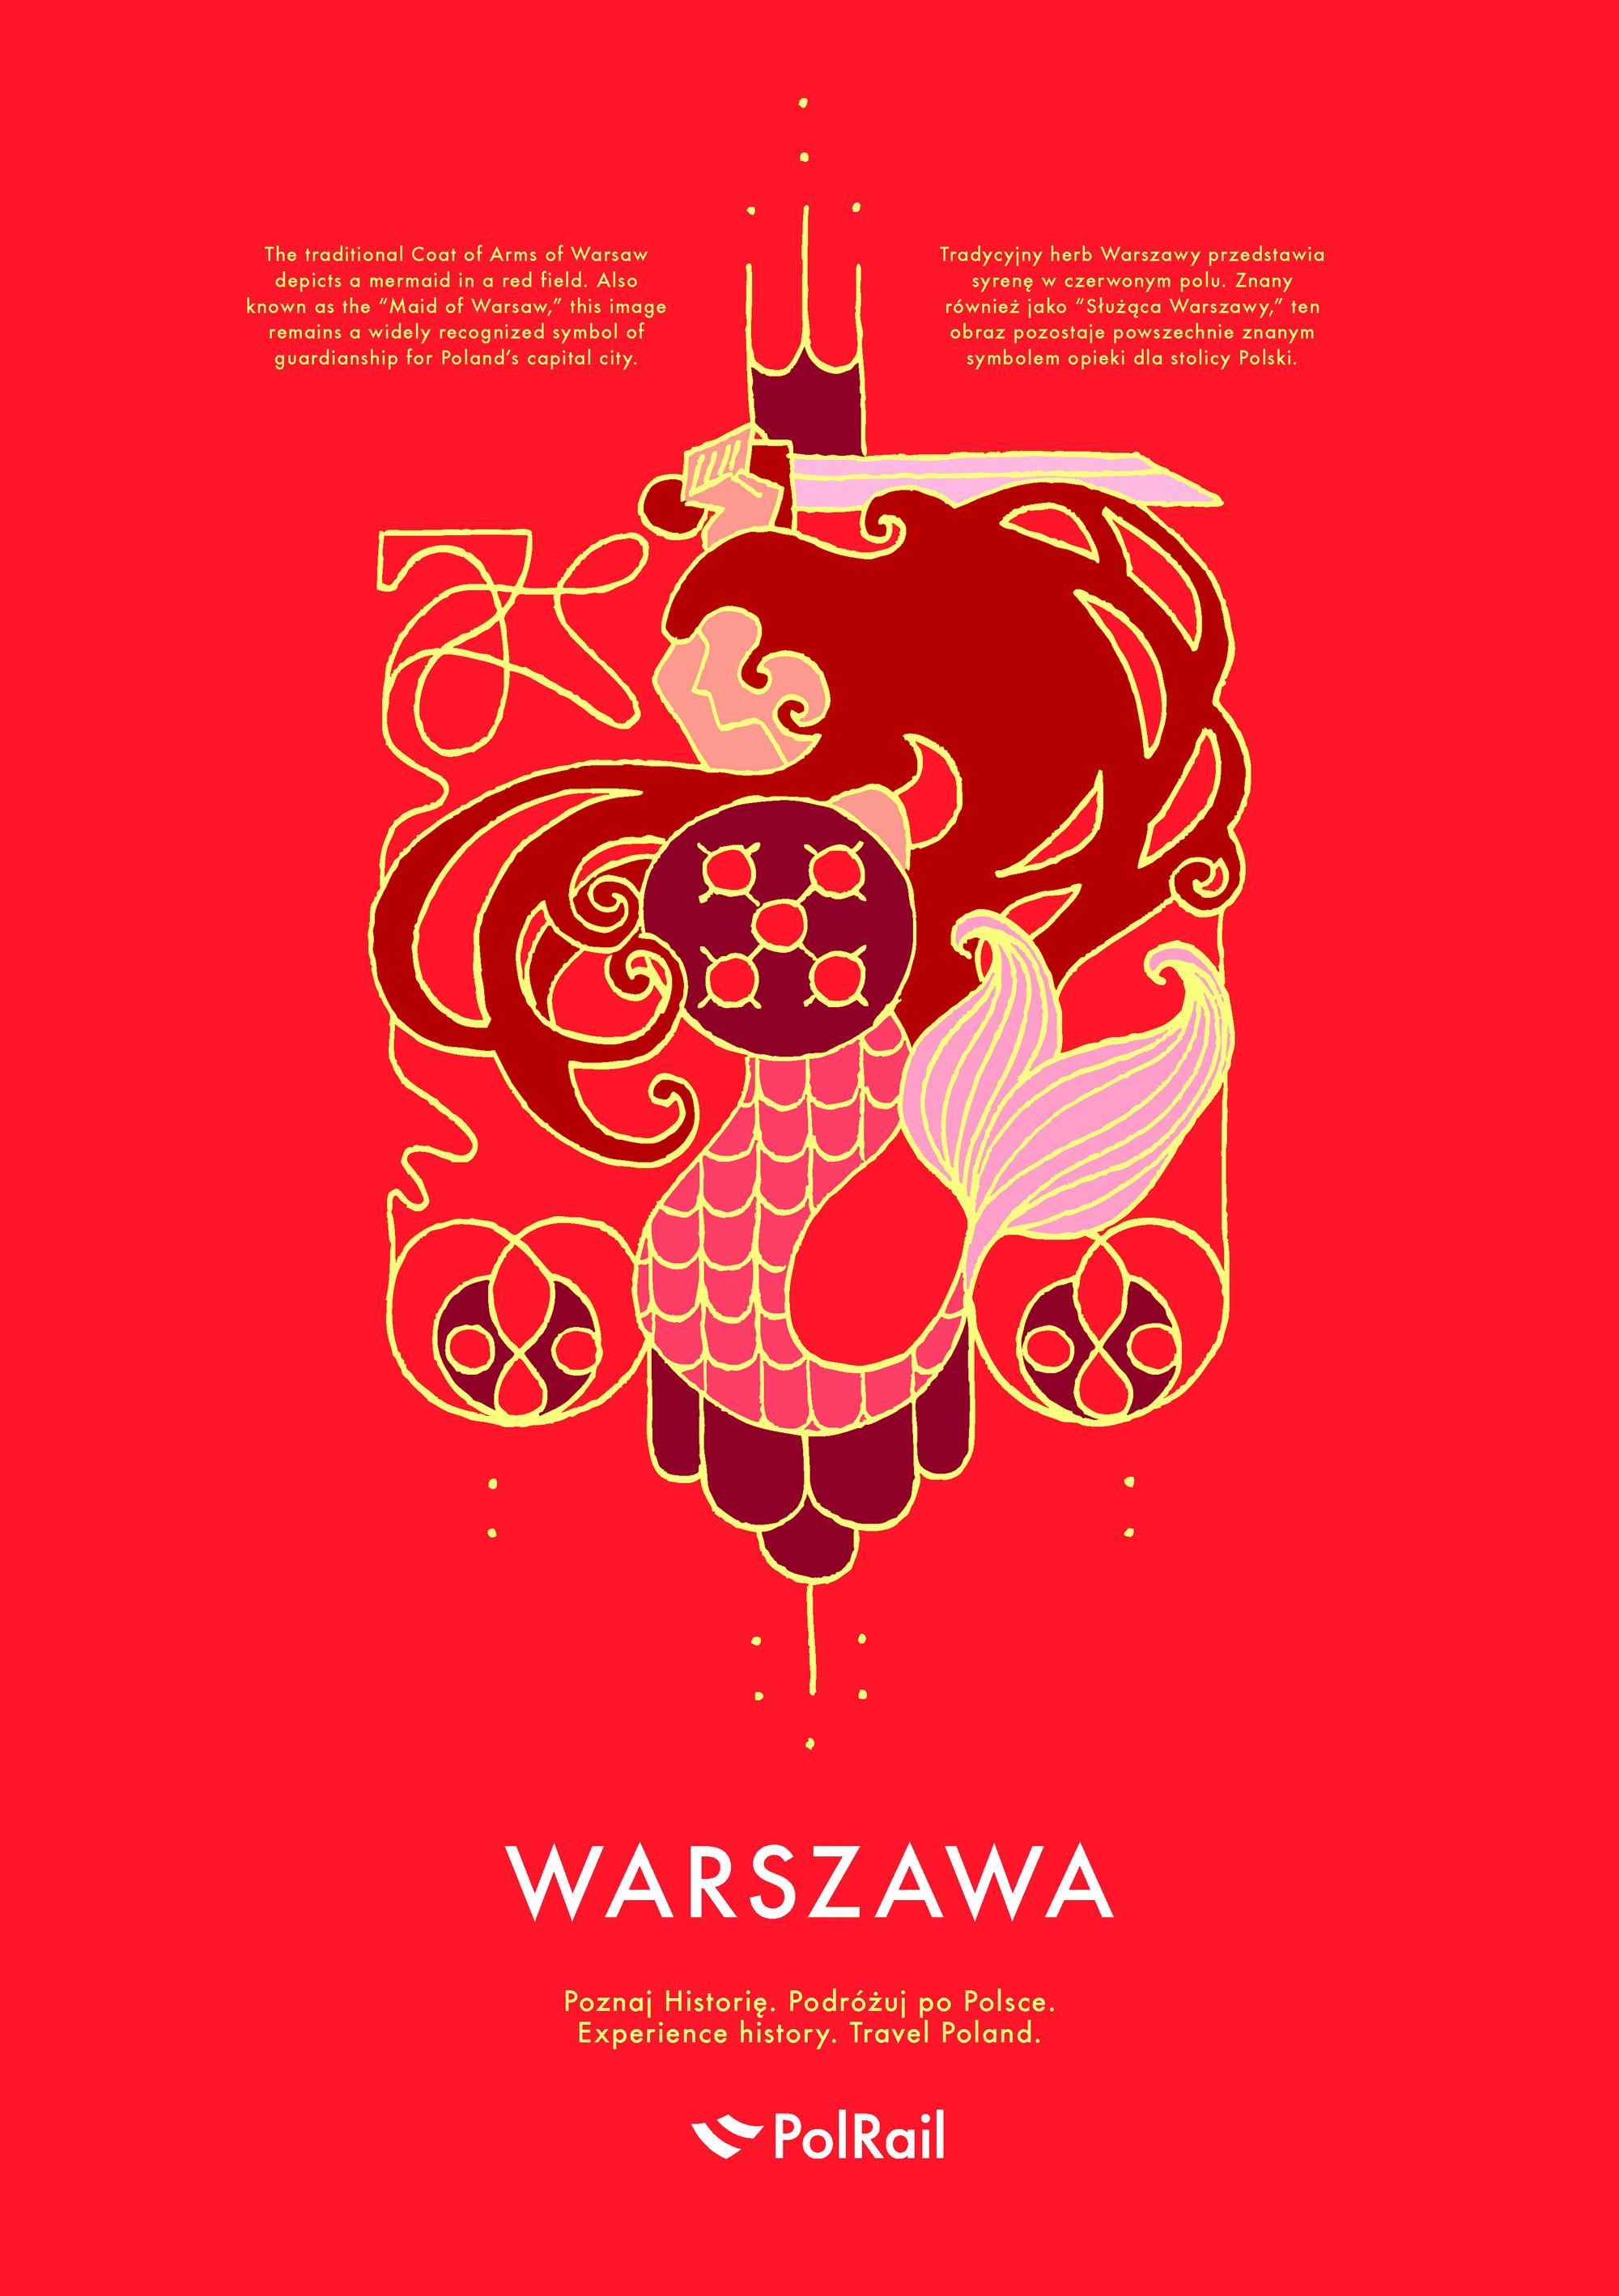 polrail-posters-warsawa.jpg